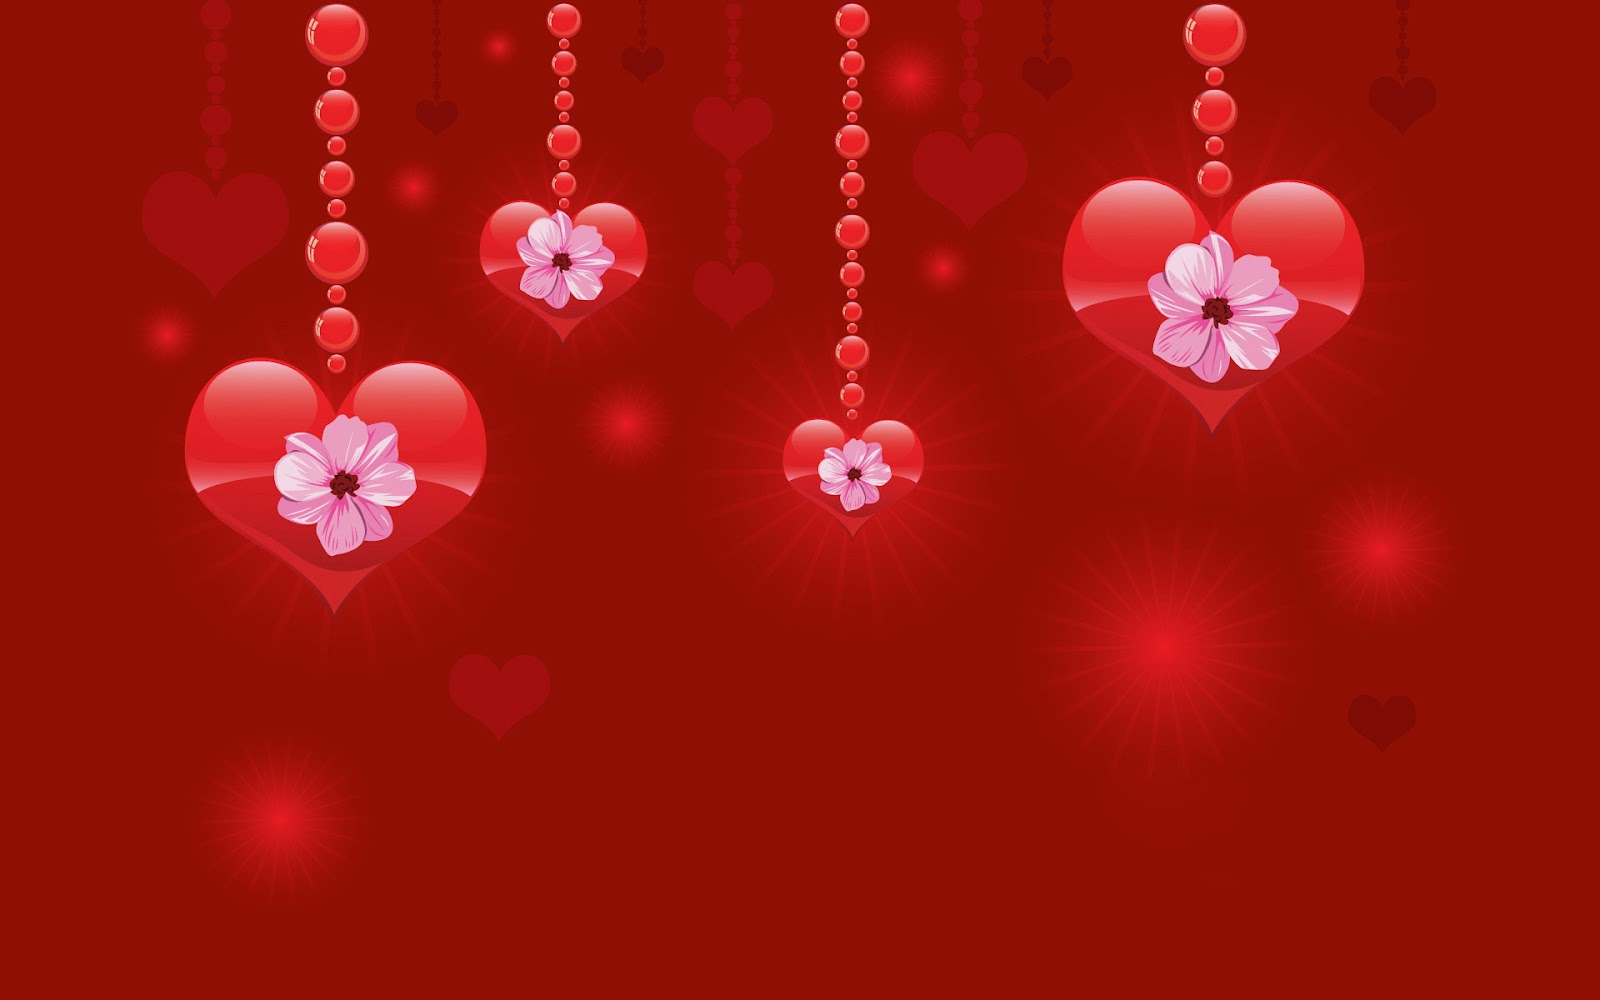 Valentines Day Wallpapers happy valentines day wallpaper valentines 1600x1000